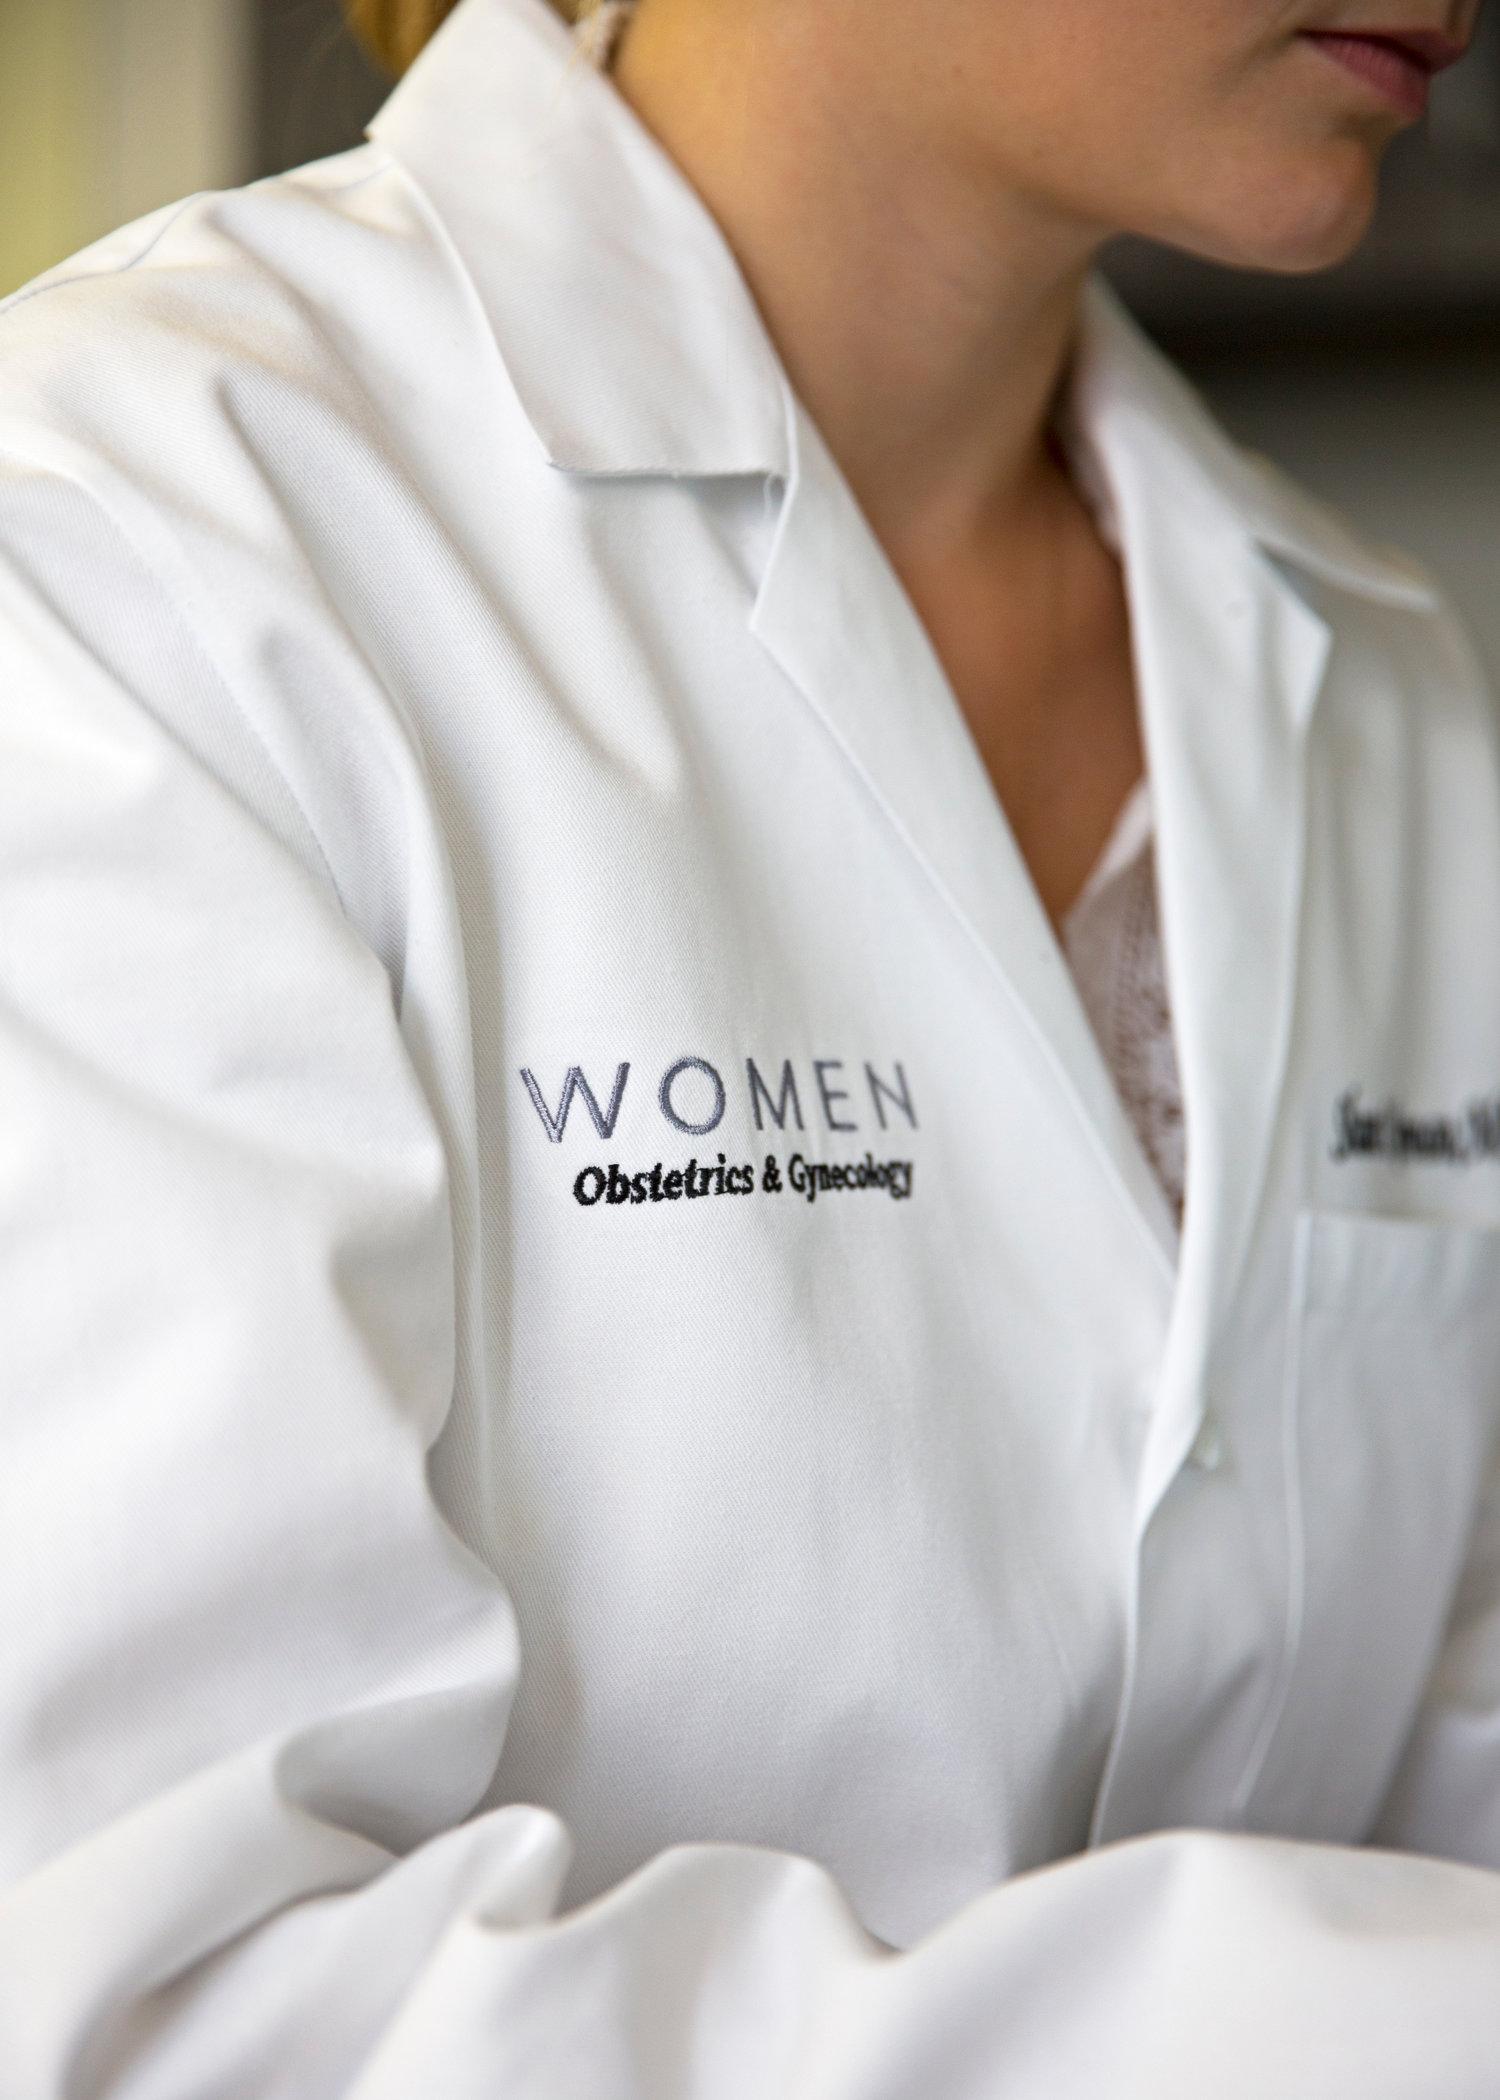 WomensOB_Branding1